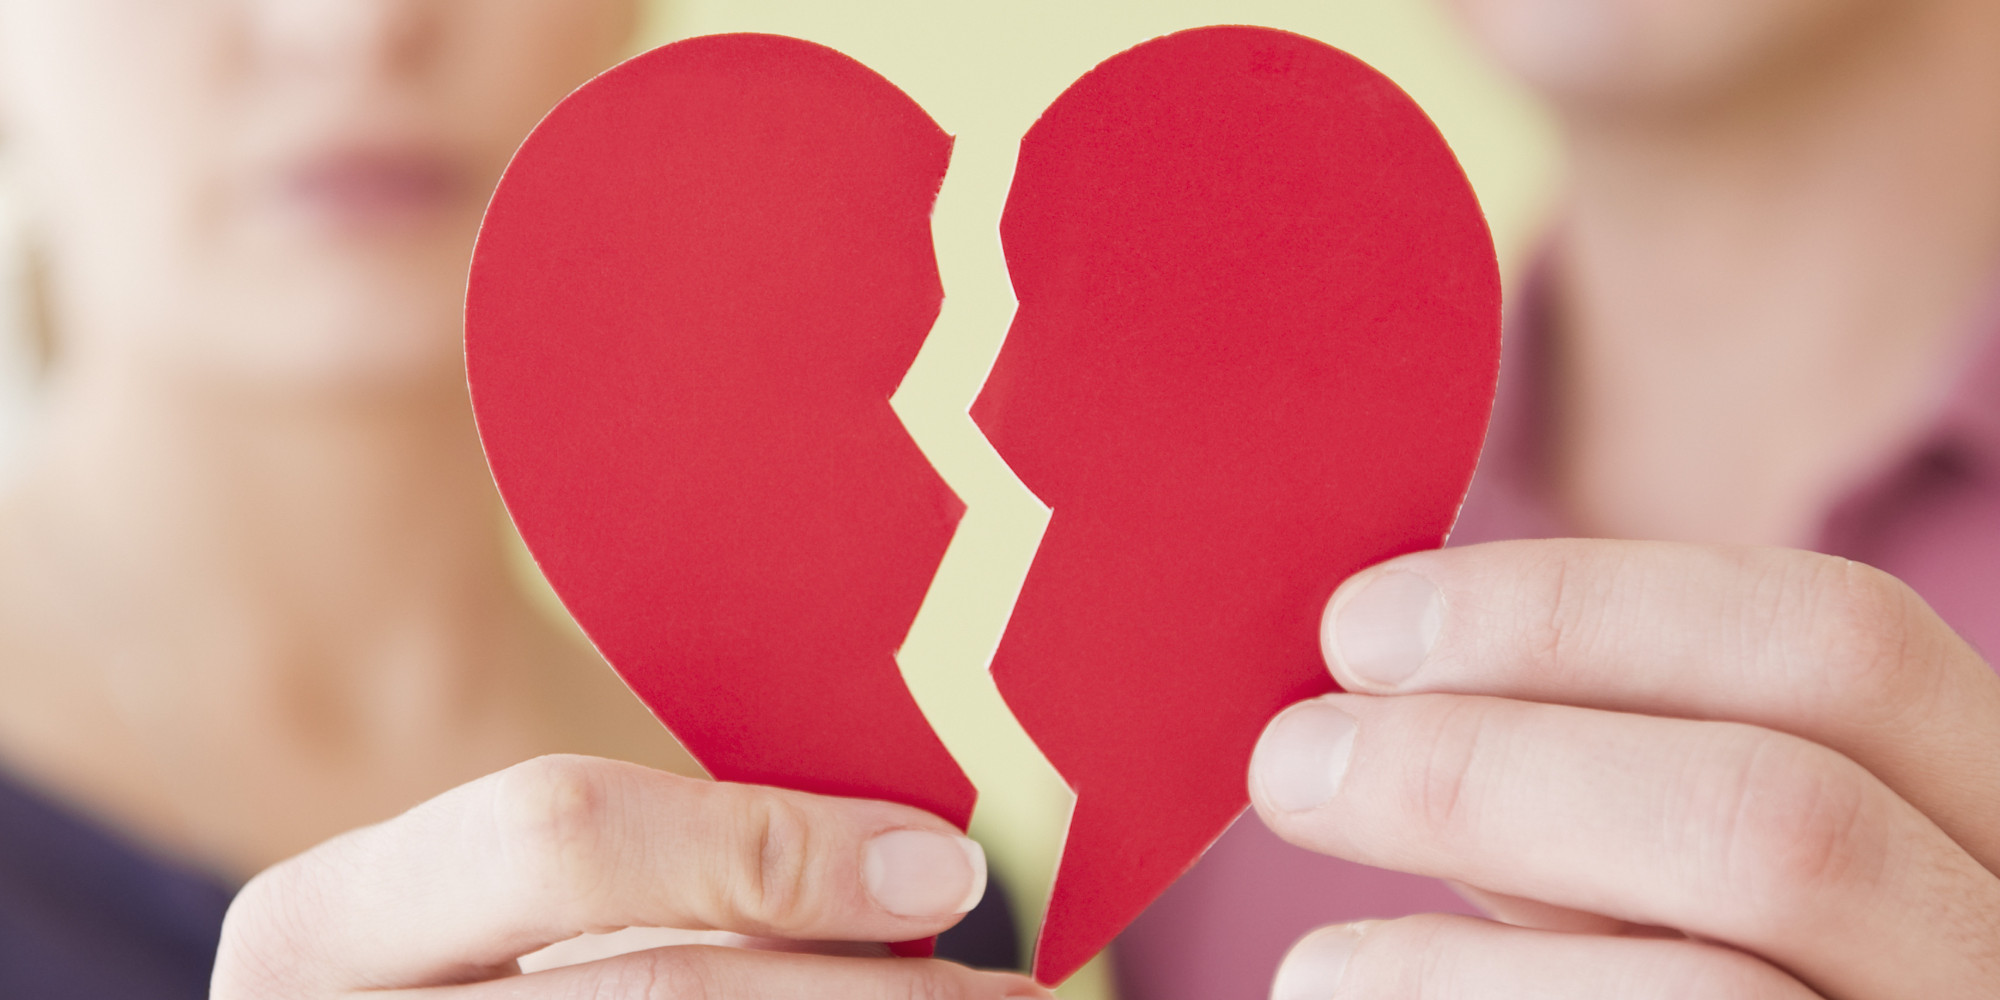 broken heart, OKAY, Break ups, research, relationship, lifestyle